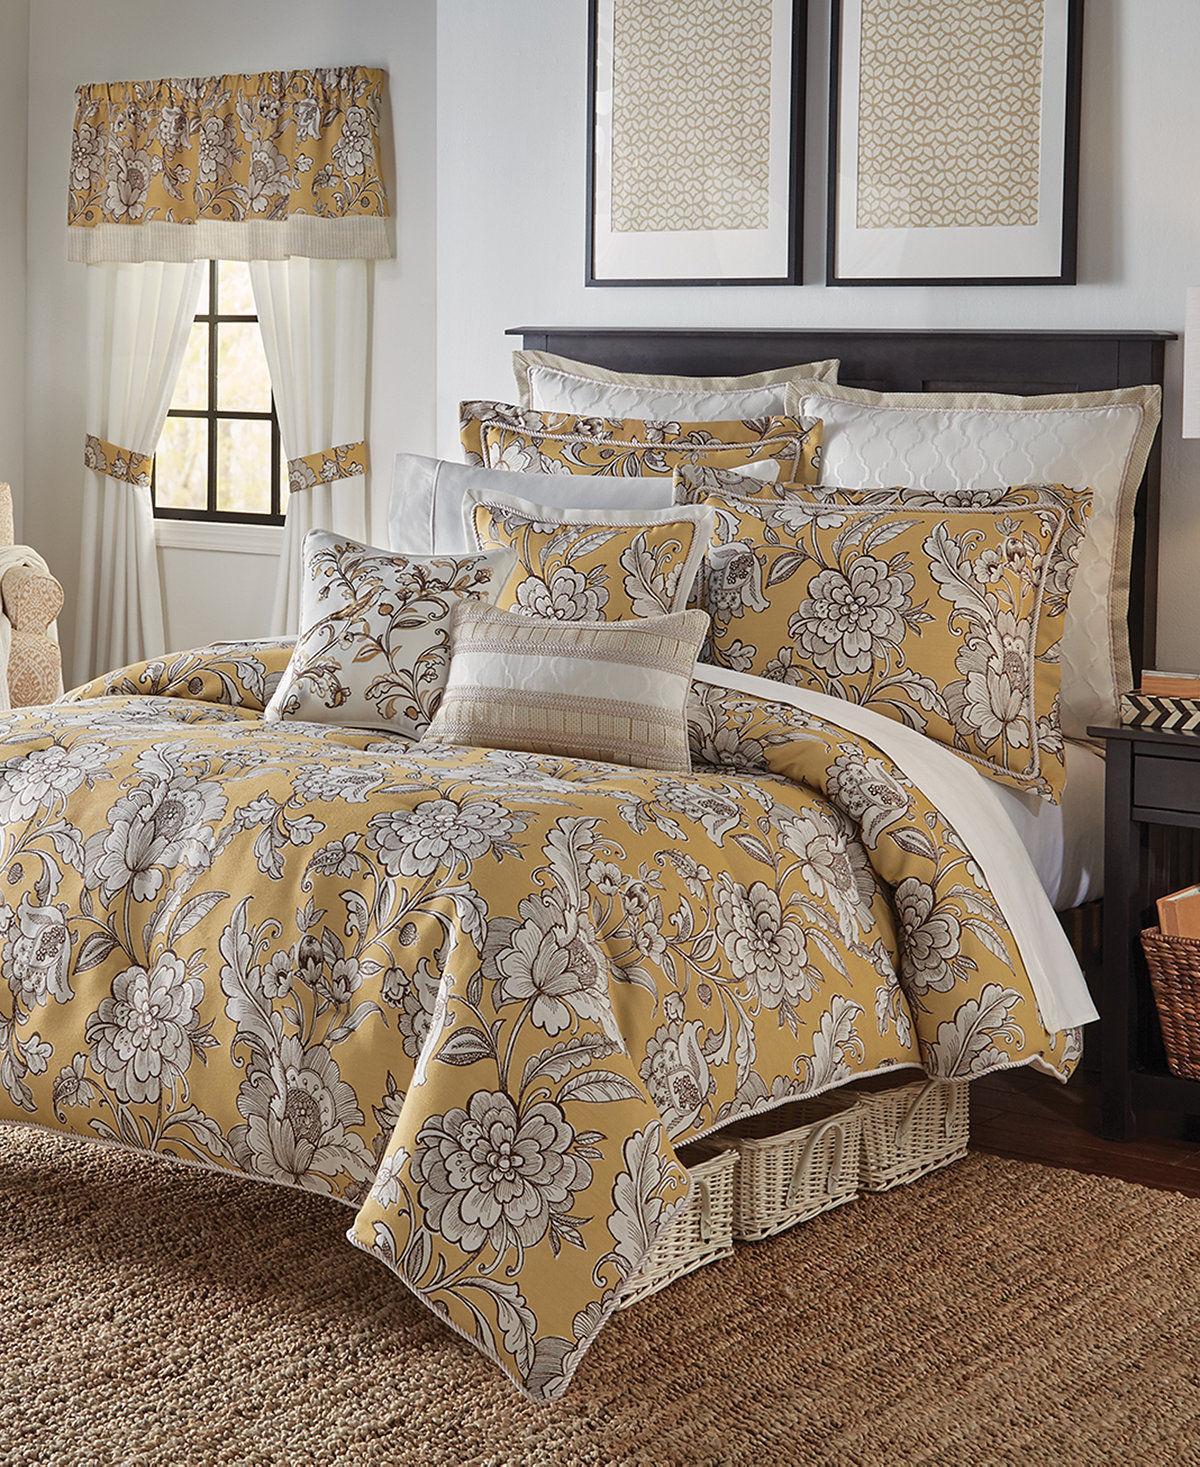 Croscill Kassandra DIJON YELLOW Full Queen Comforter + 2 Sta